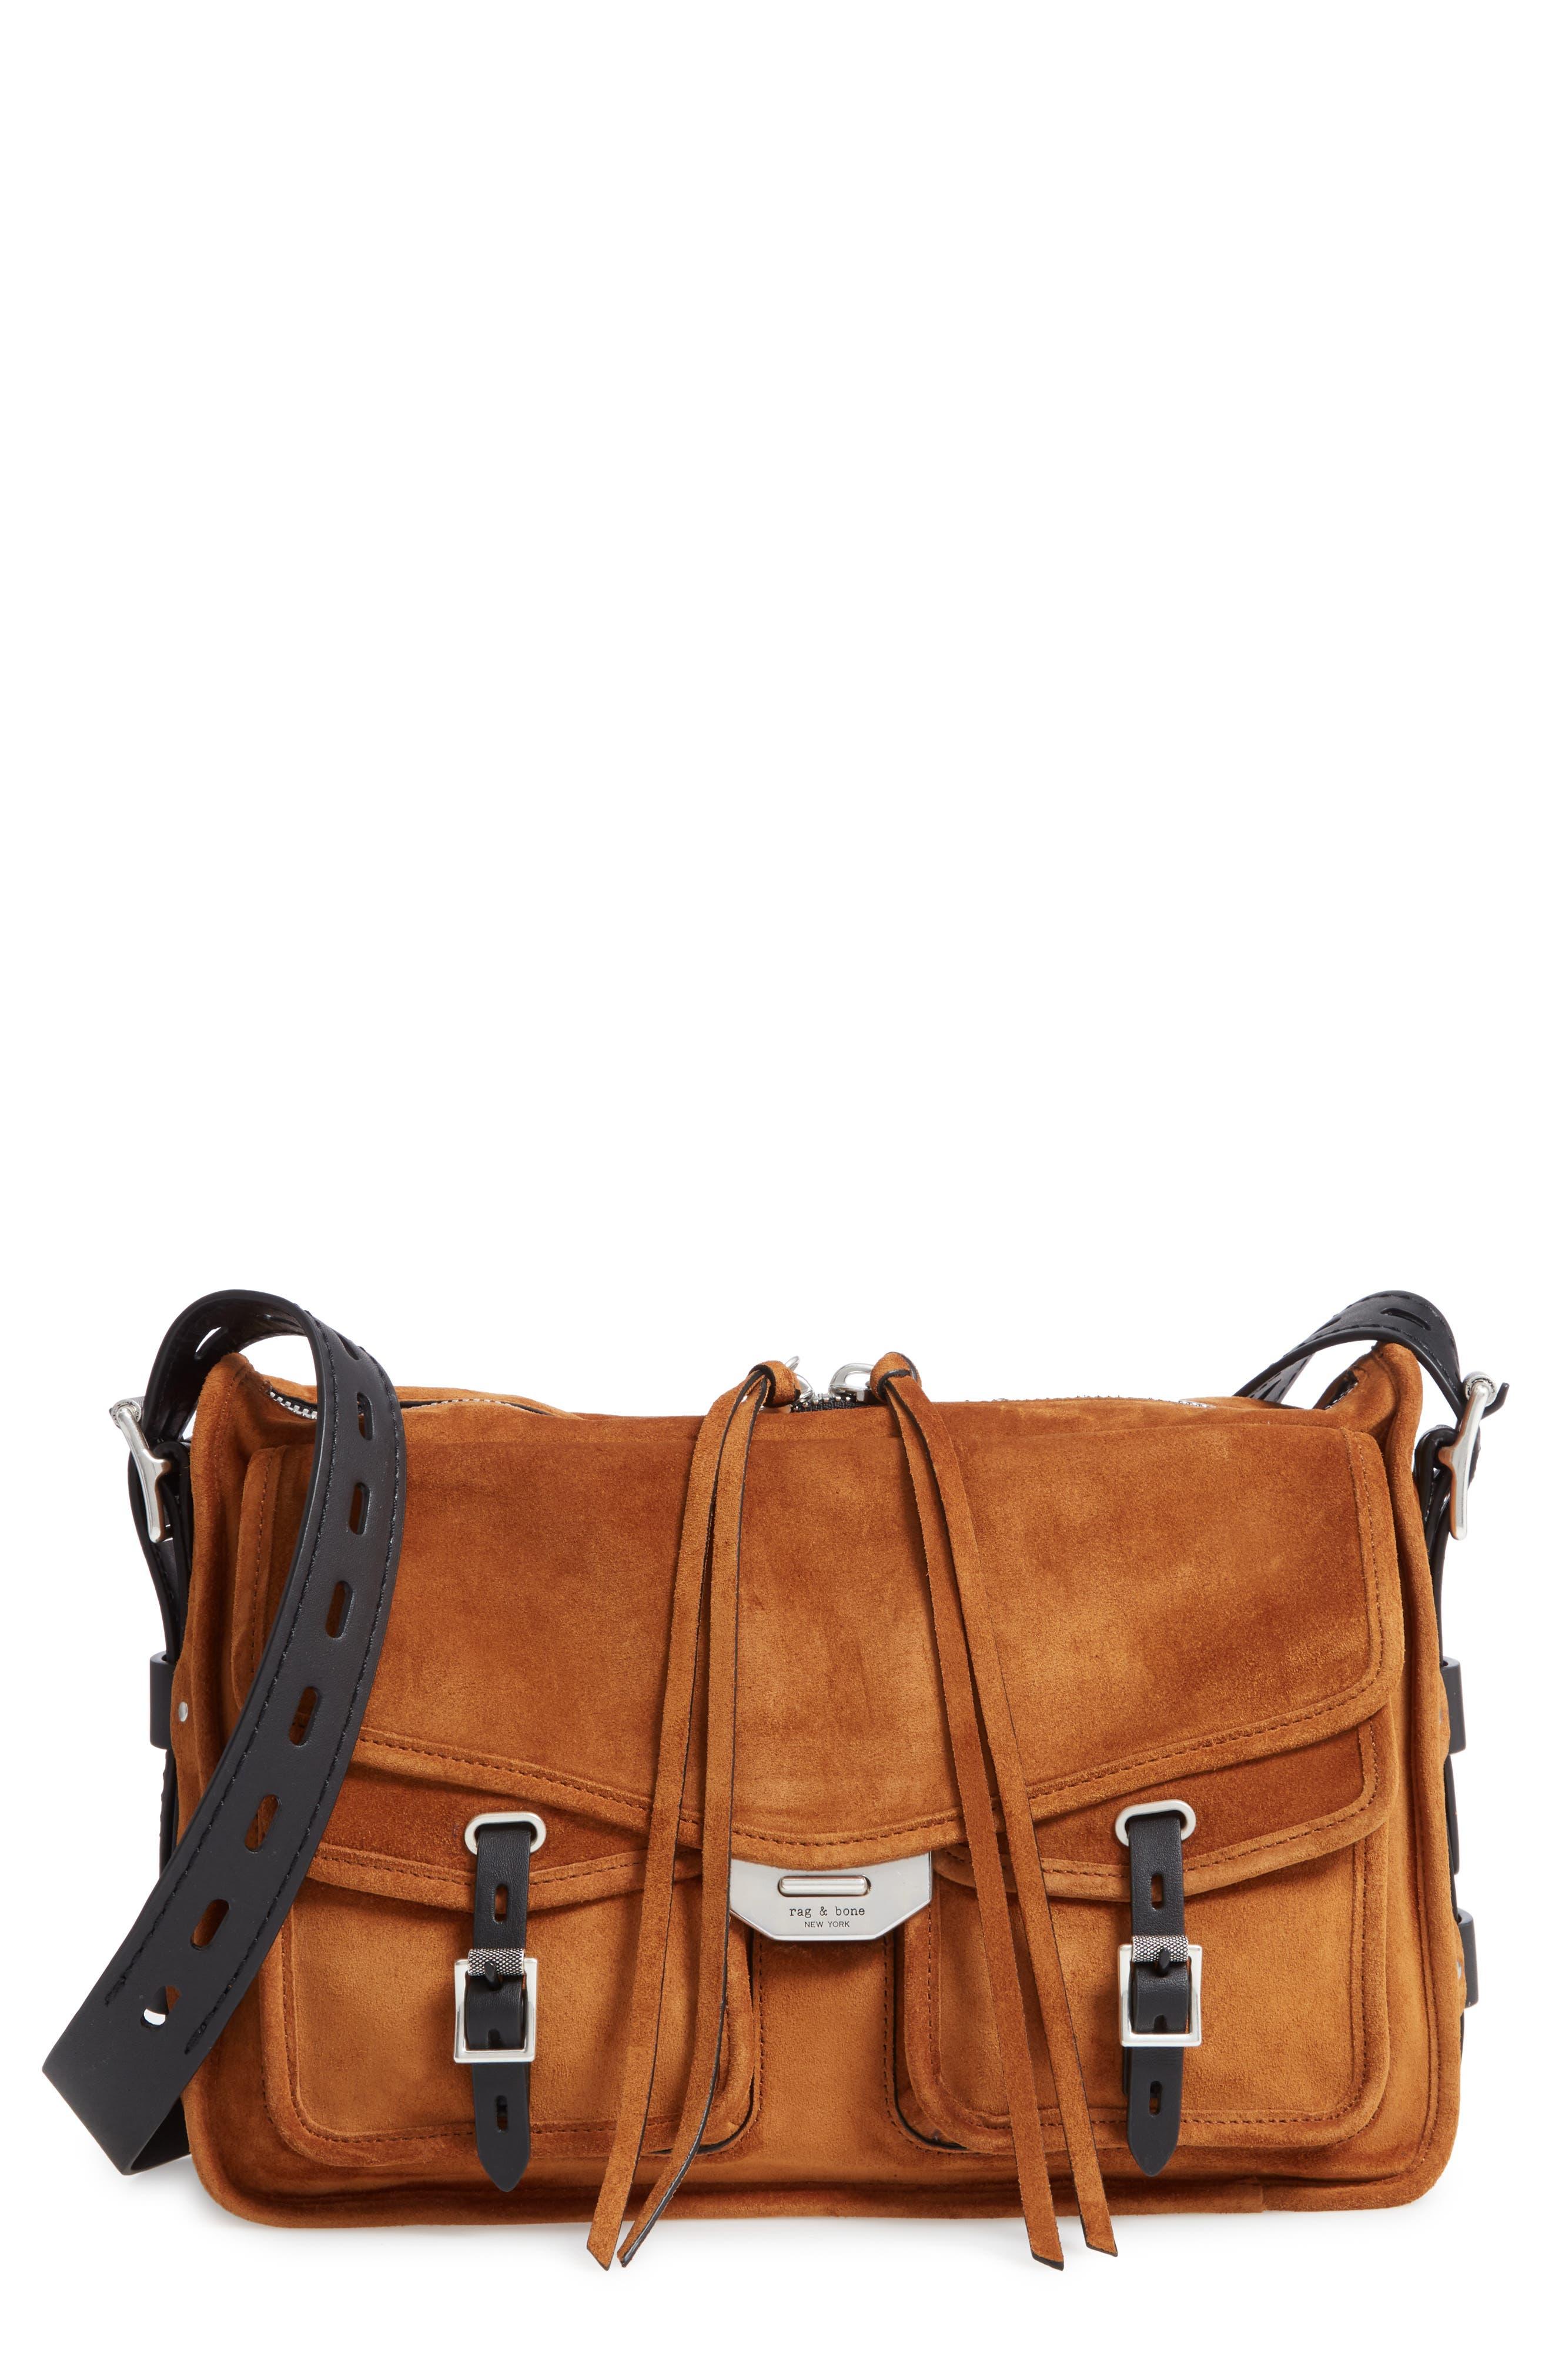 Field Leather Messenger Bag,                             Main thumbnail 1, color,                             TAN SUEDE